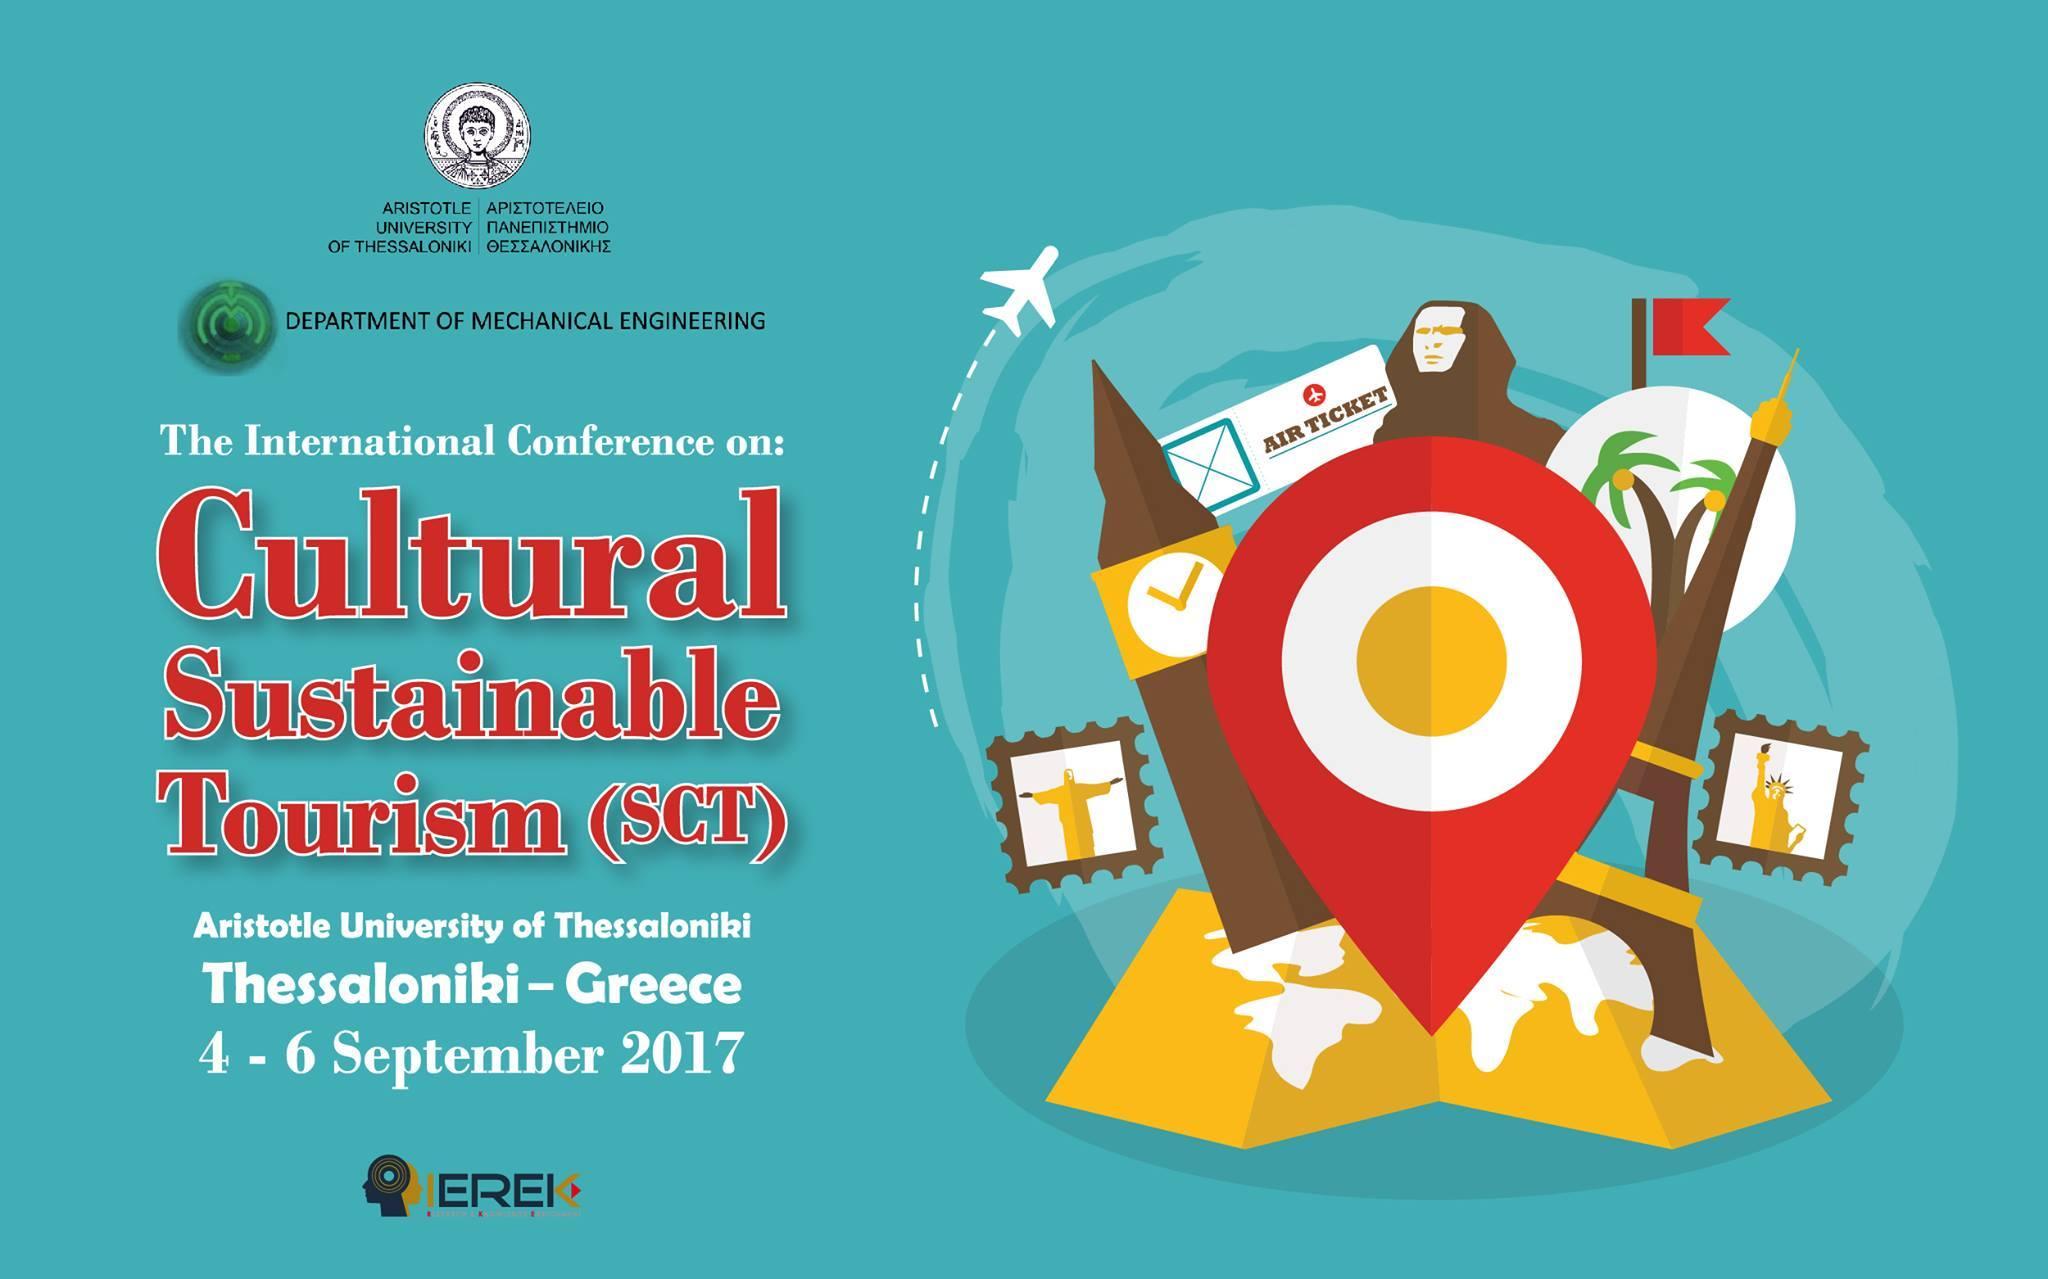 Cultural Sustainable Tourism (CST) Image